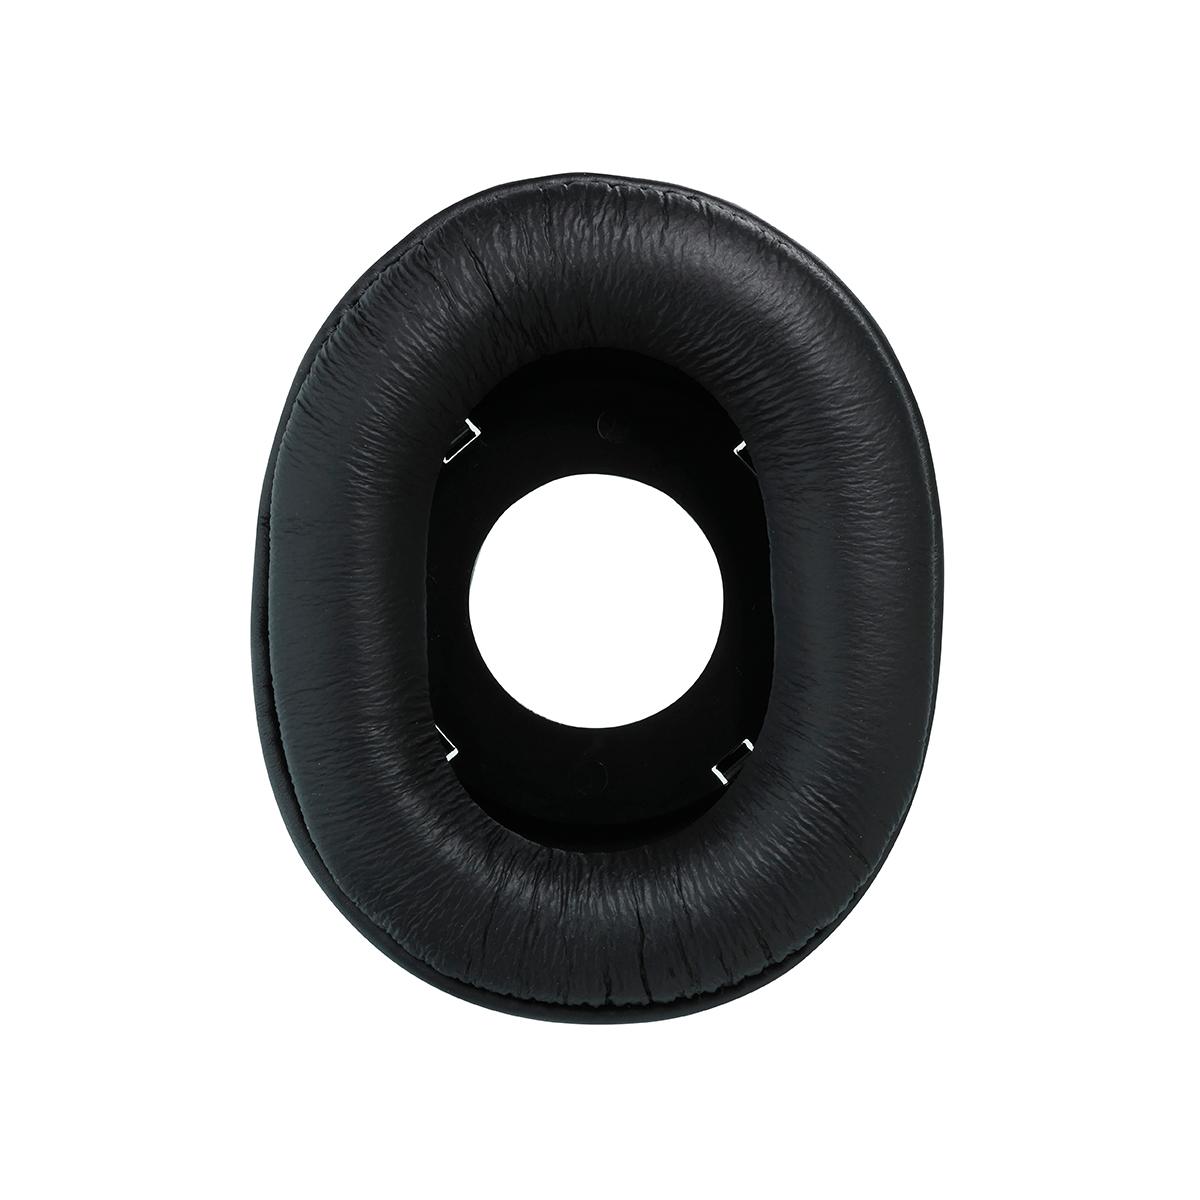 Plantronics 83195-01 Circumnaural Headset Ear-Cushions Pack of 2